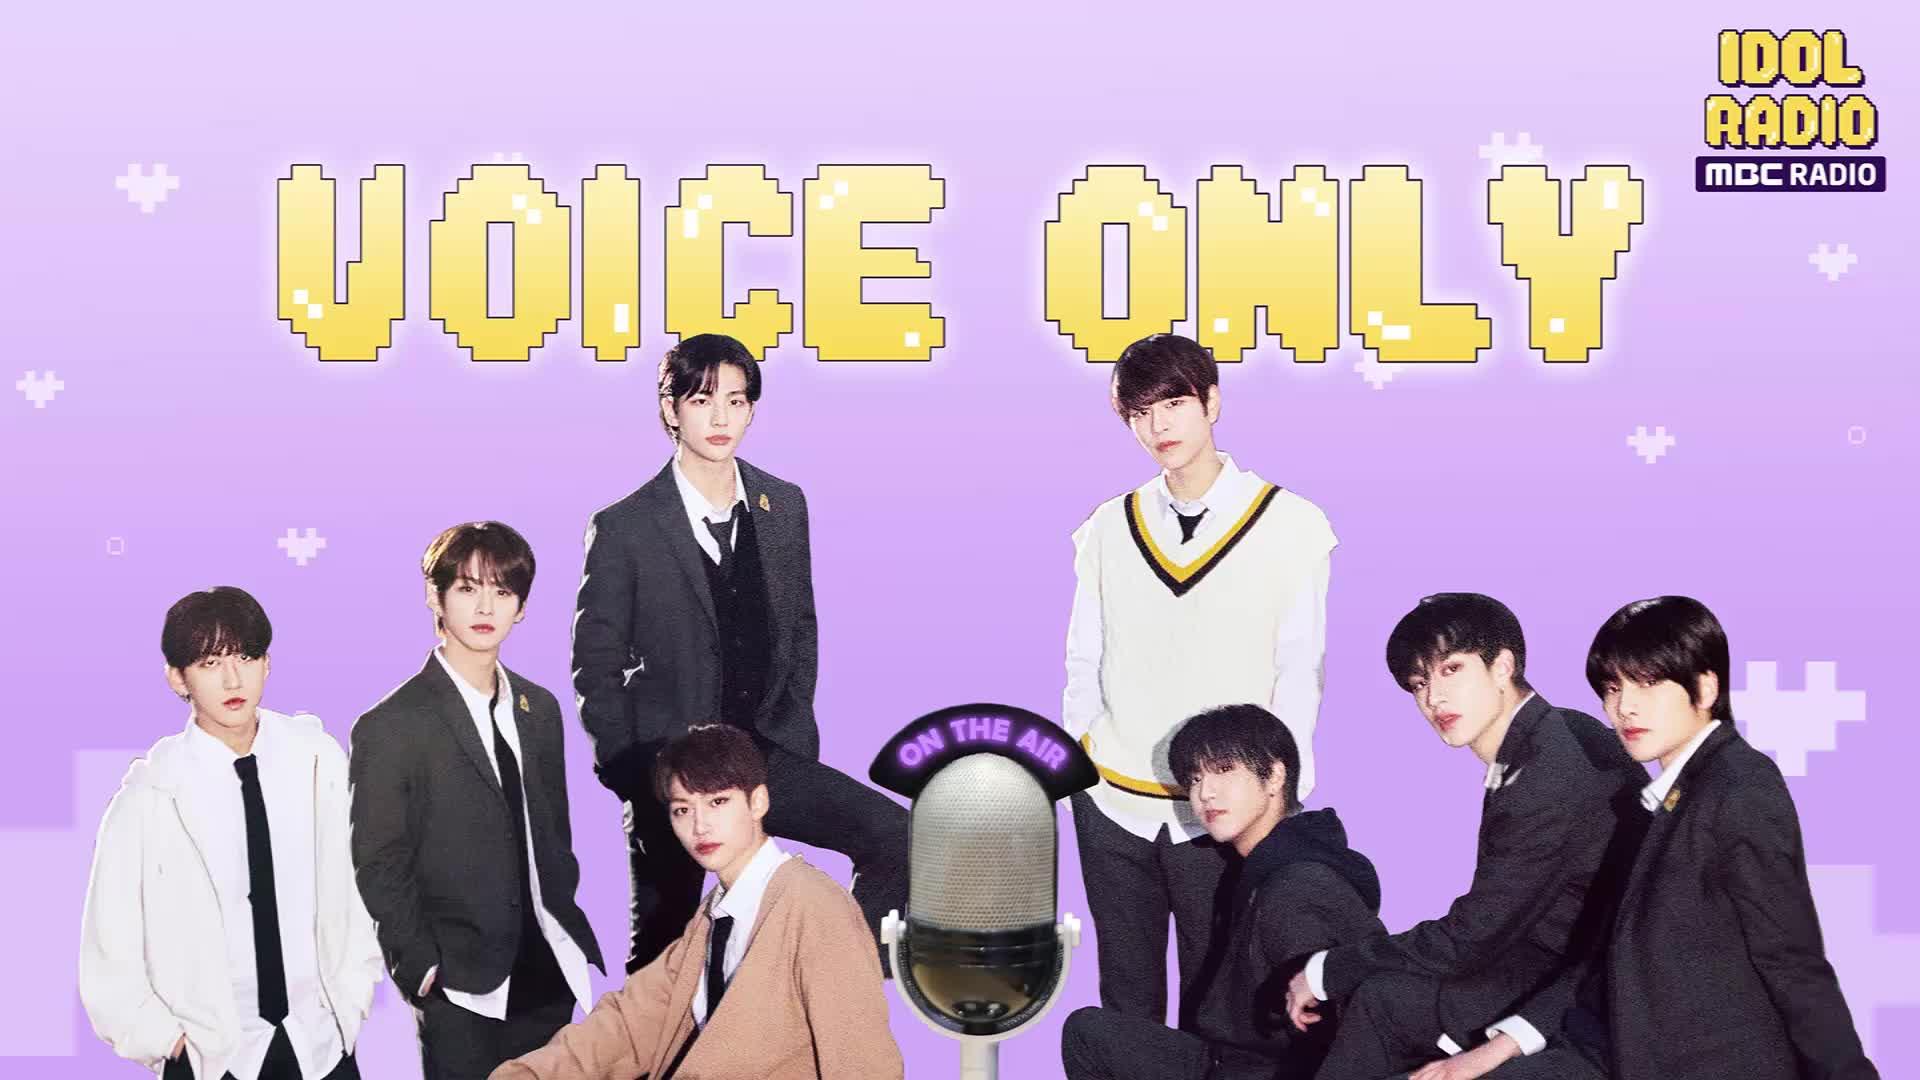 [Full]'IDOL RADIO' ep#544. 아이돌 플레이리스트 (스페셜 DJ 스트레이키즈 방찬&한 with 스트레이키즈)